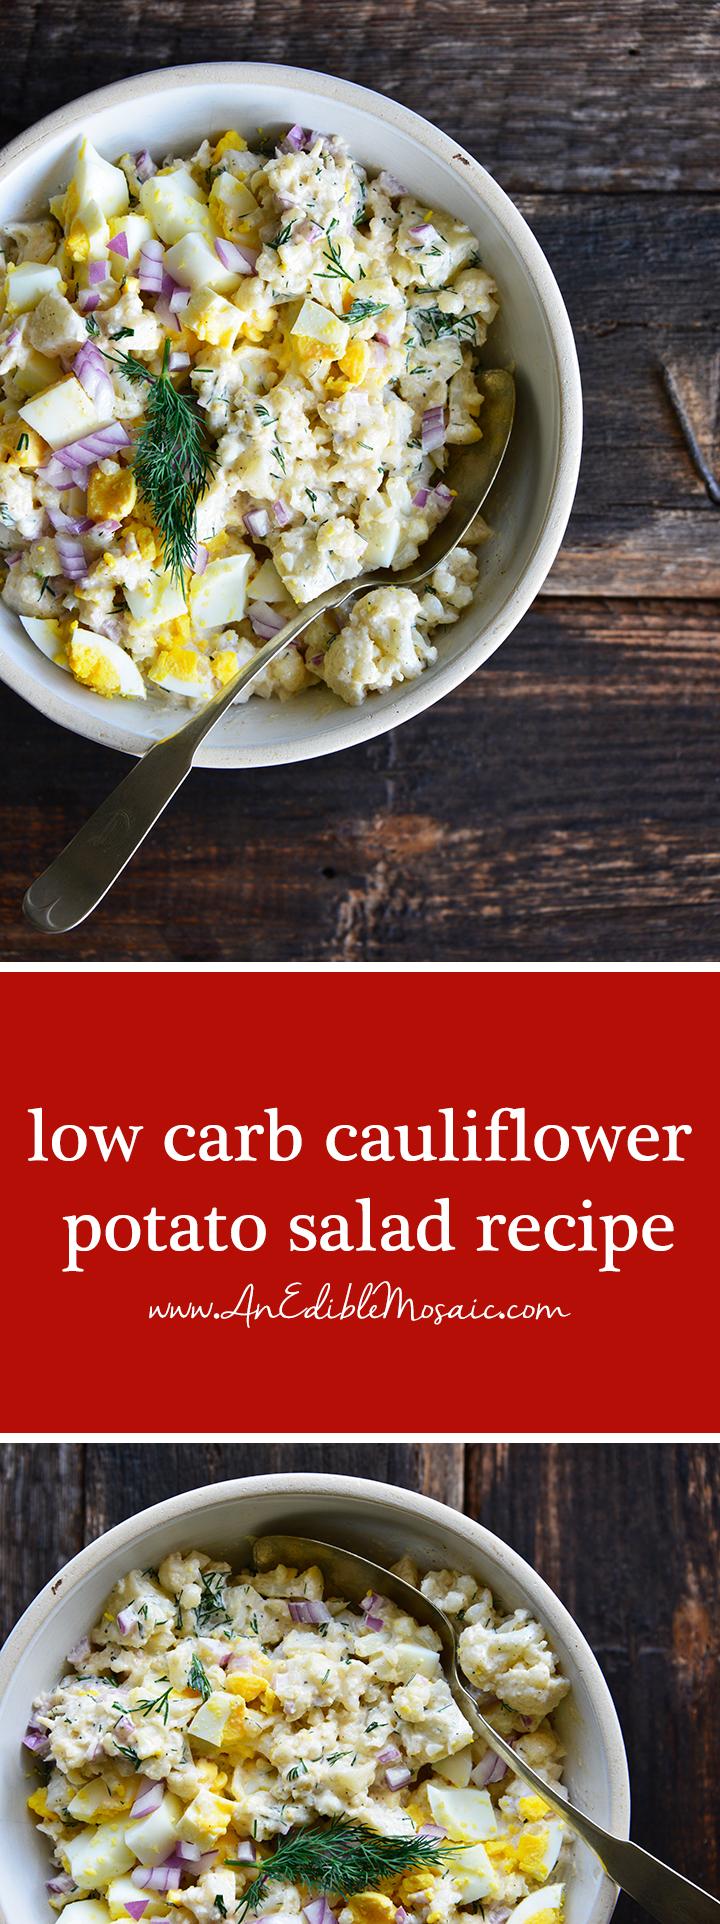 Low Carb Cauliflower Potato Salad Recipe Pin